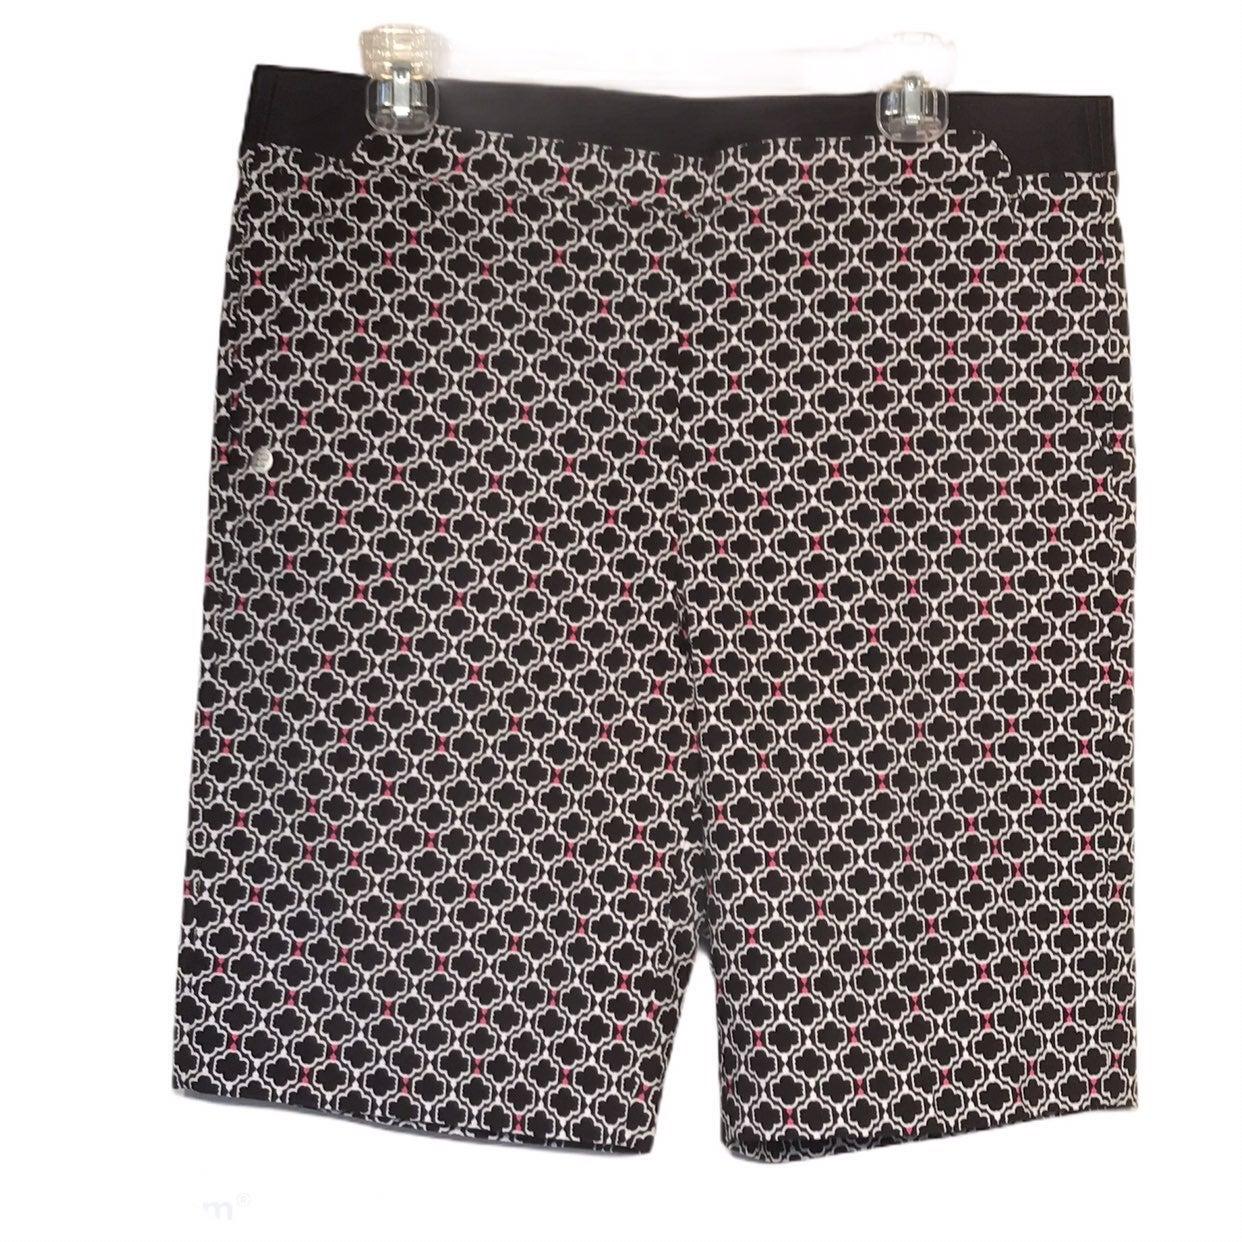 EP Pro Print Golf Activewear Shorts